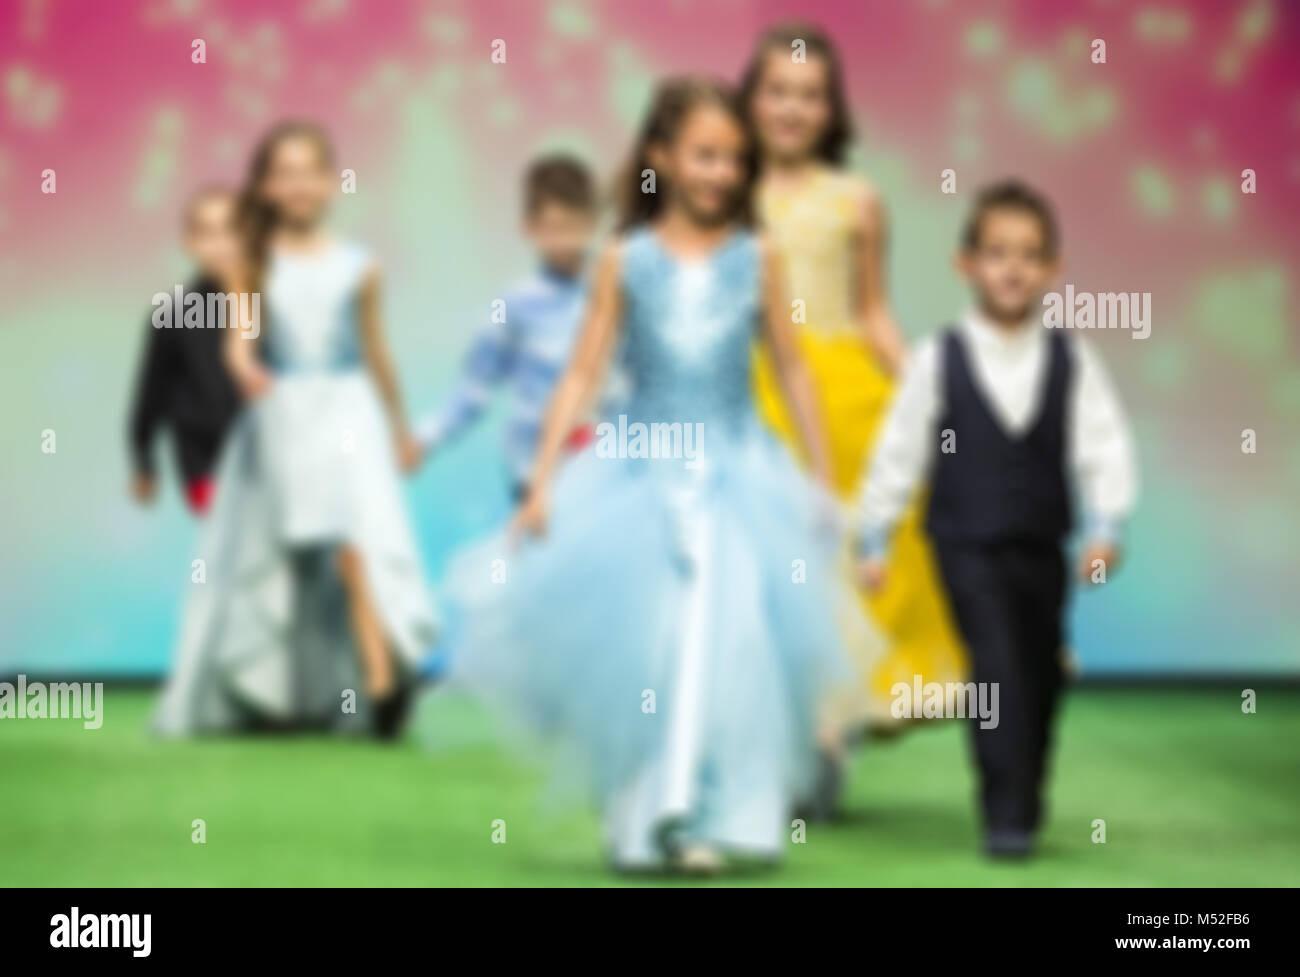 Fashion show children modeling - Stock Image